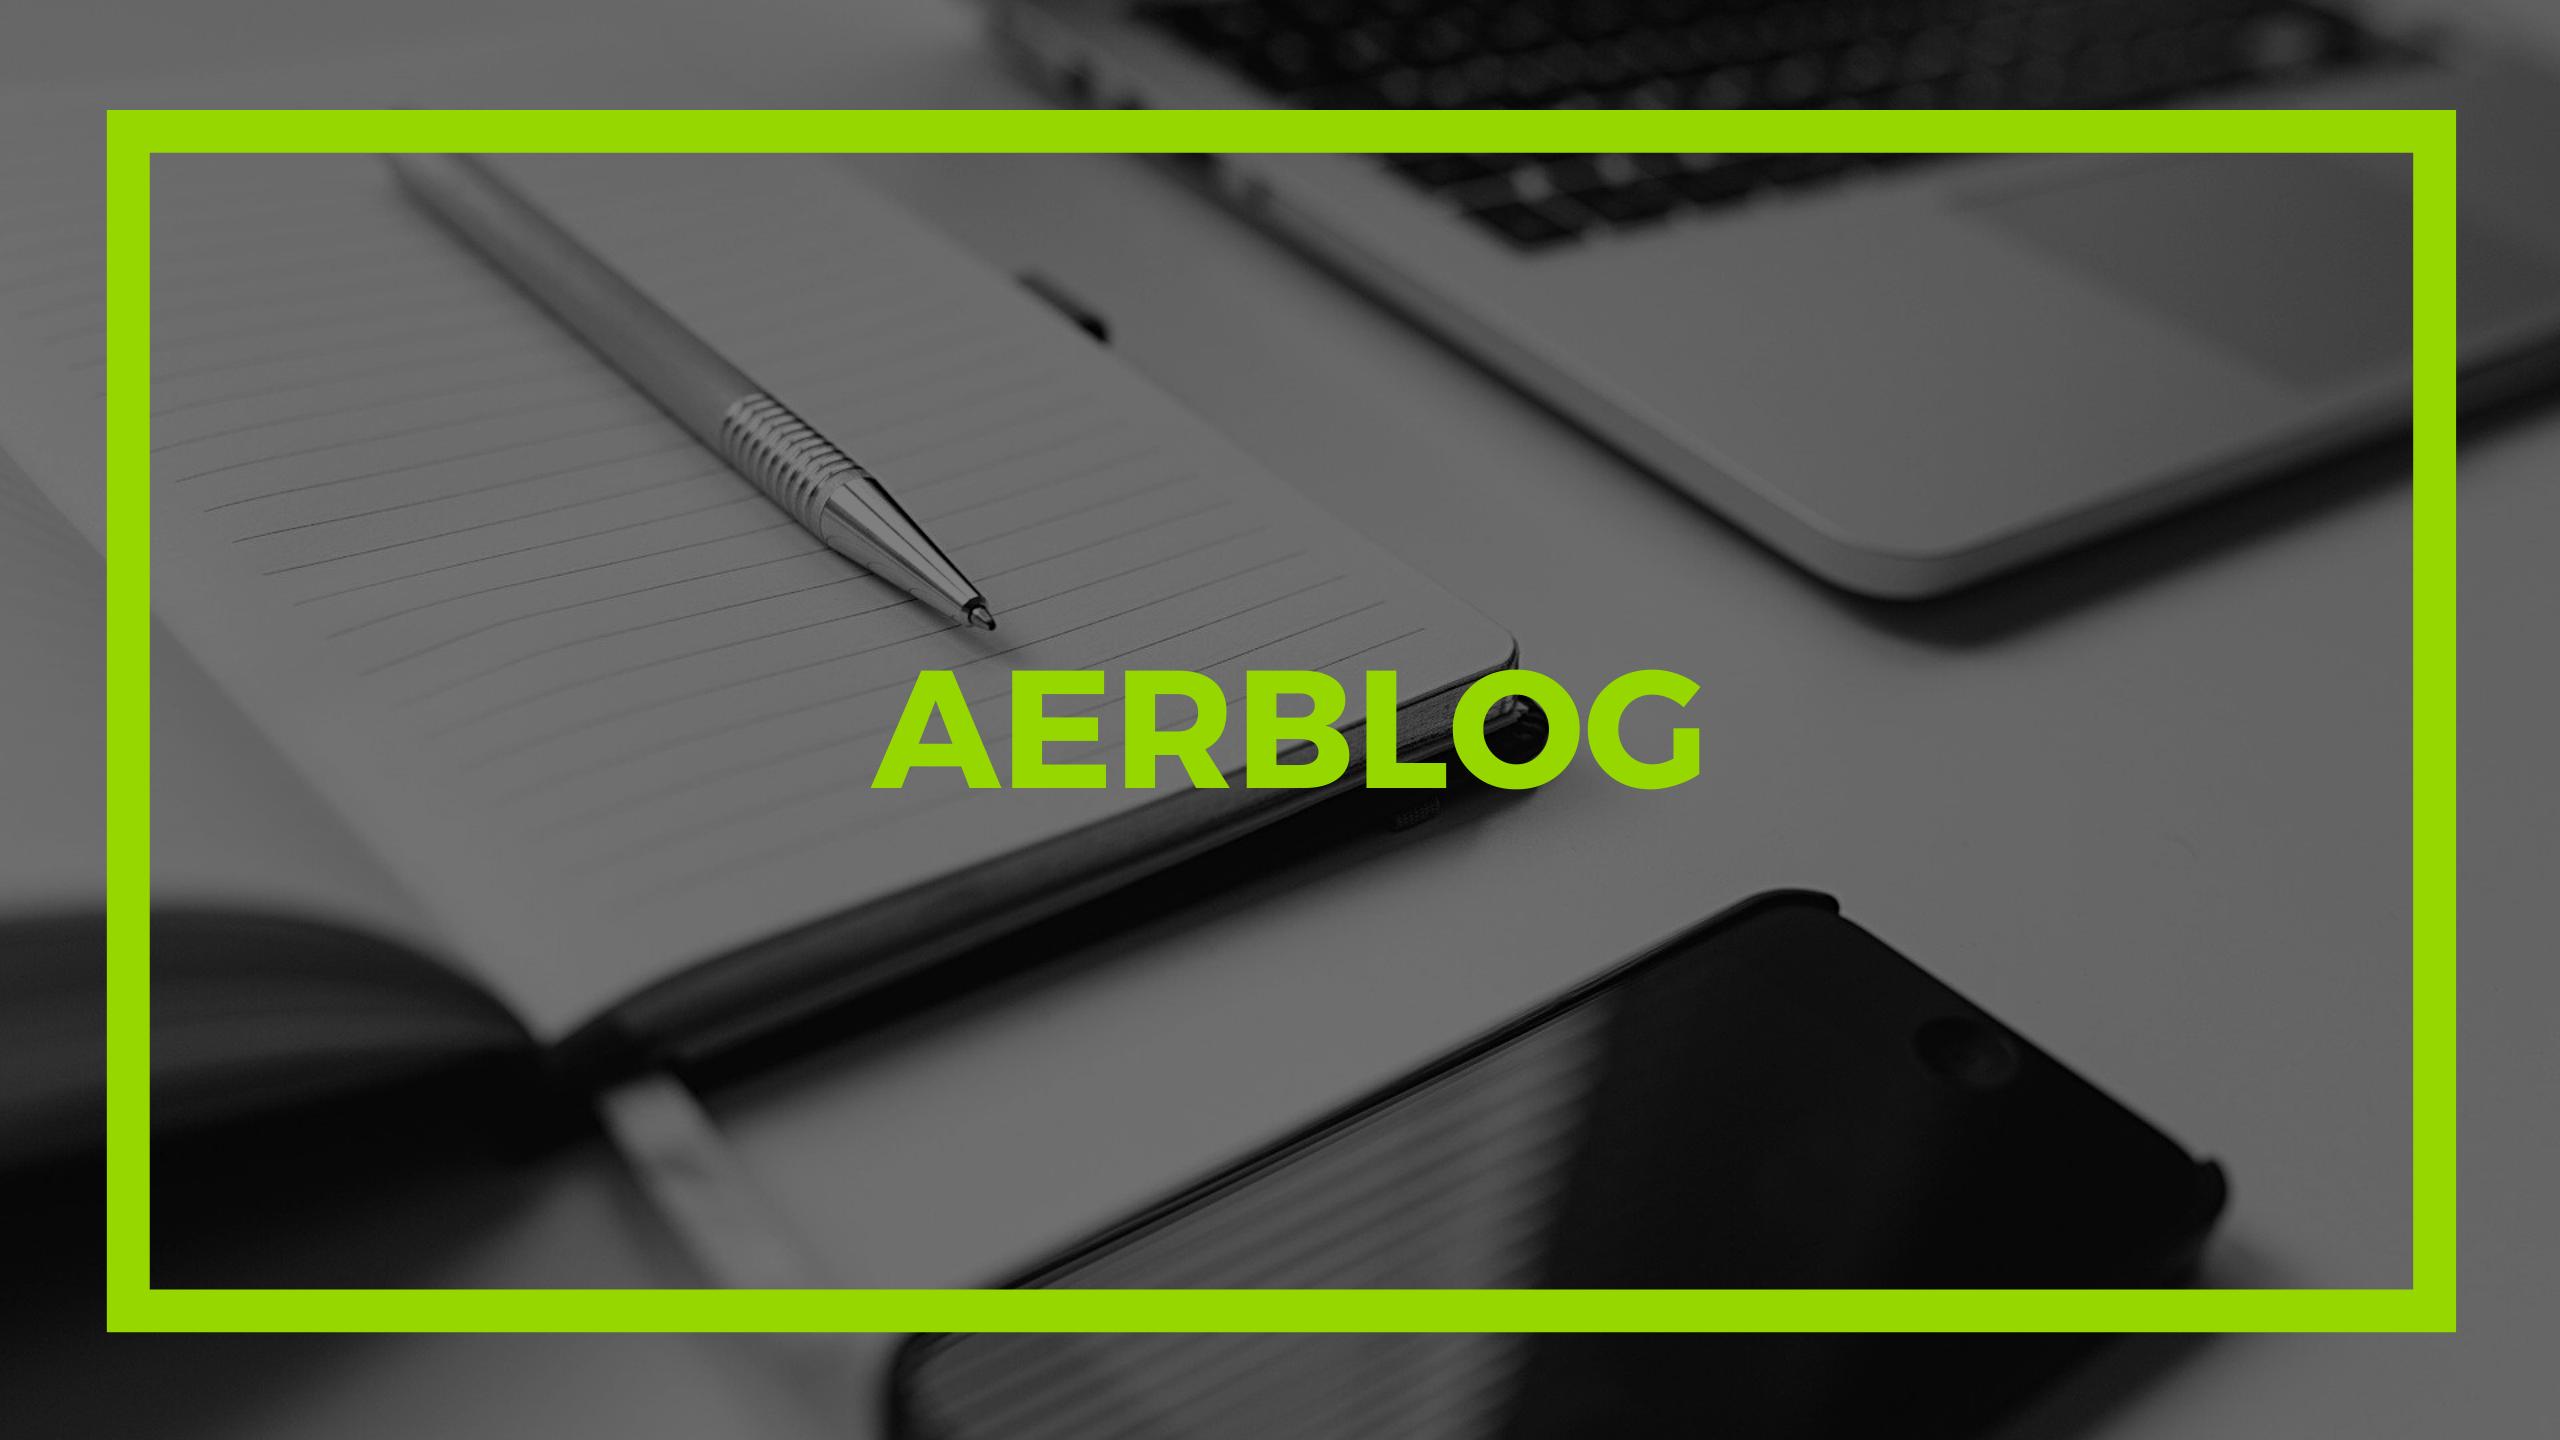 Aerblog